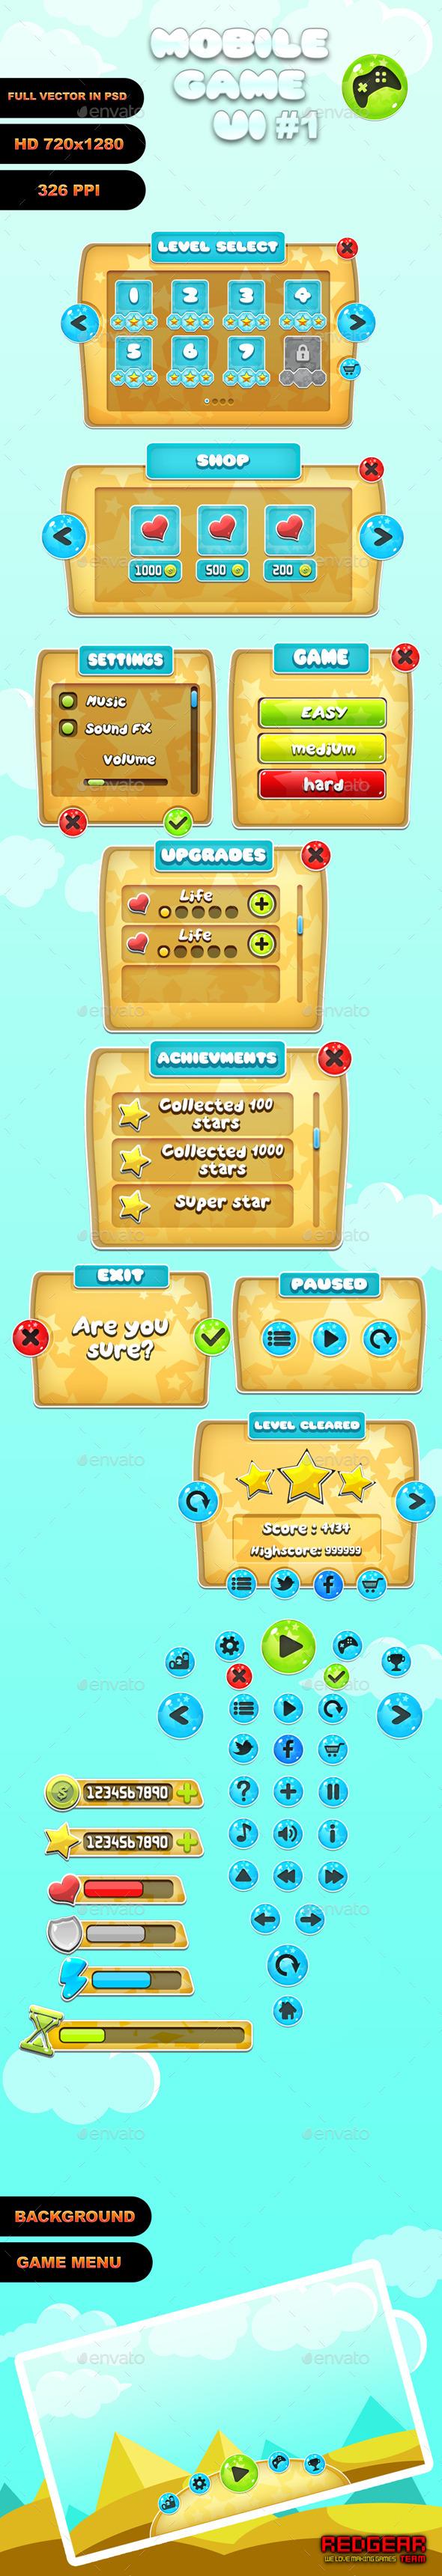 GraphicRiver Mobile Game UI #1 10513895